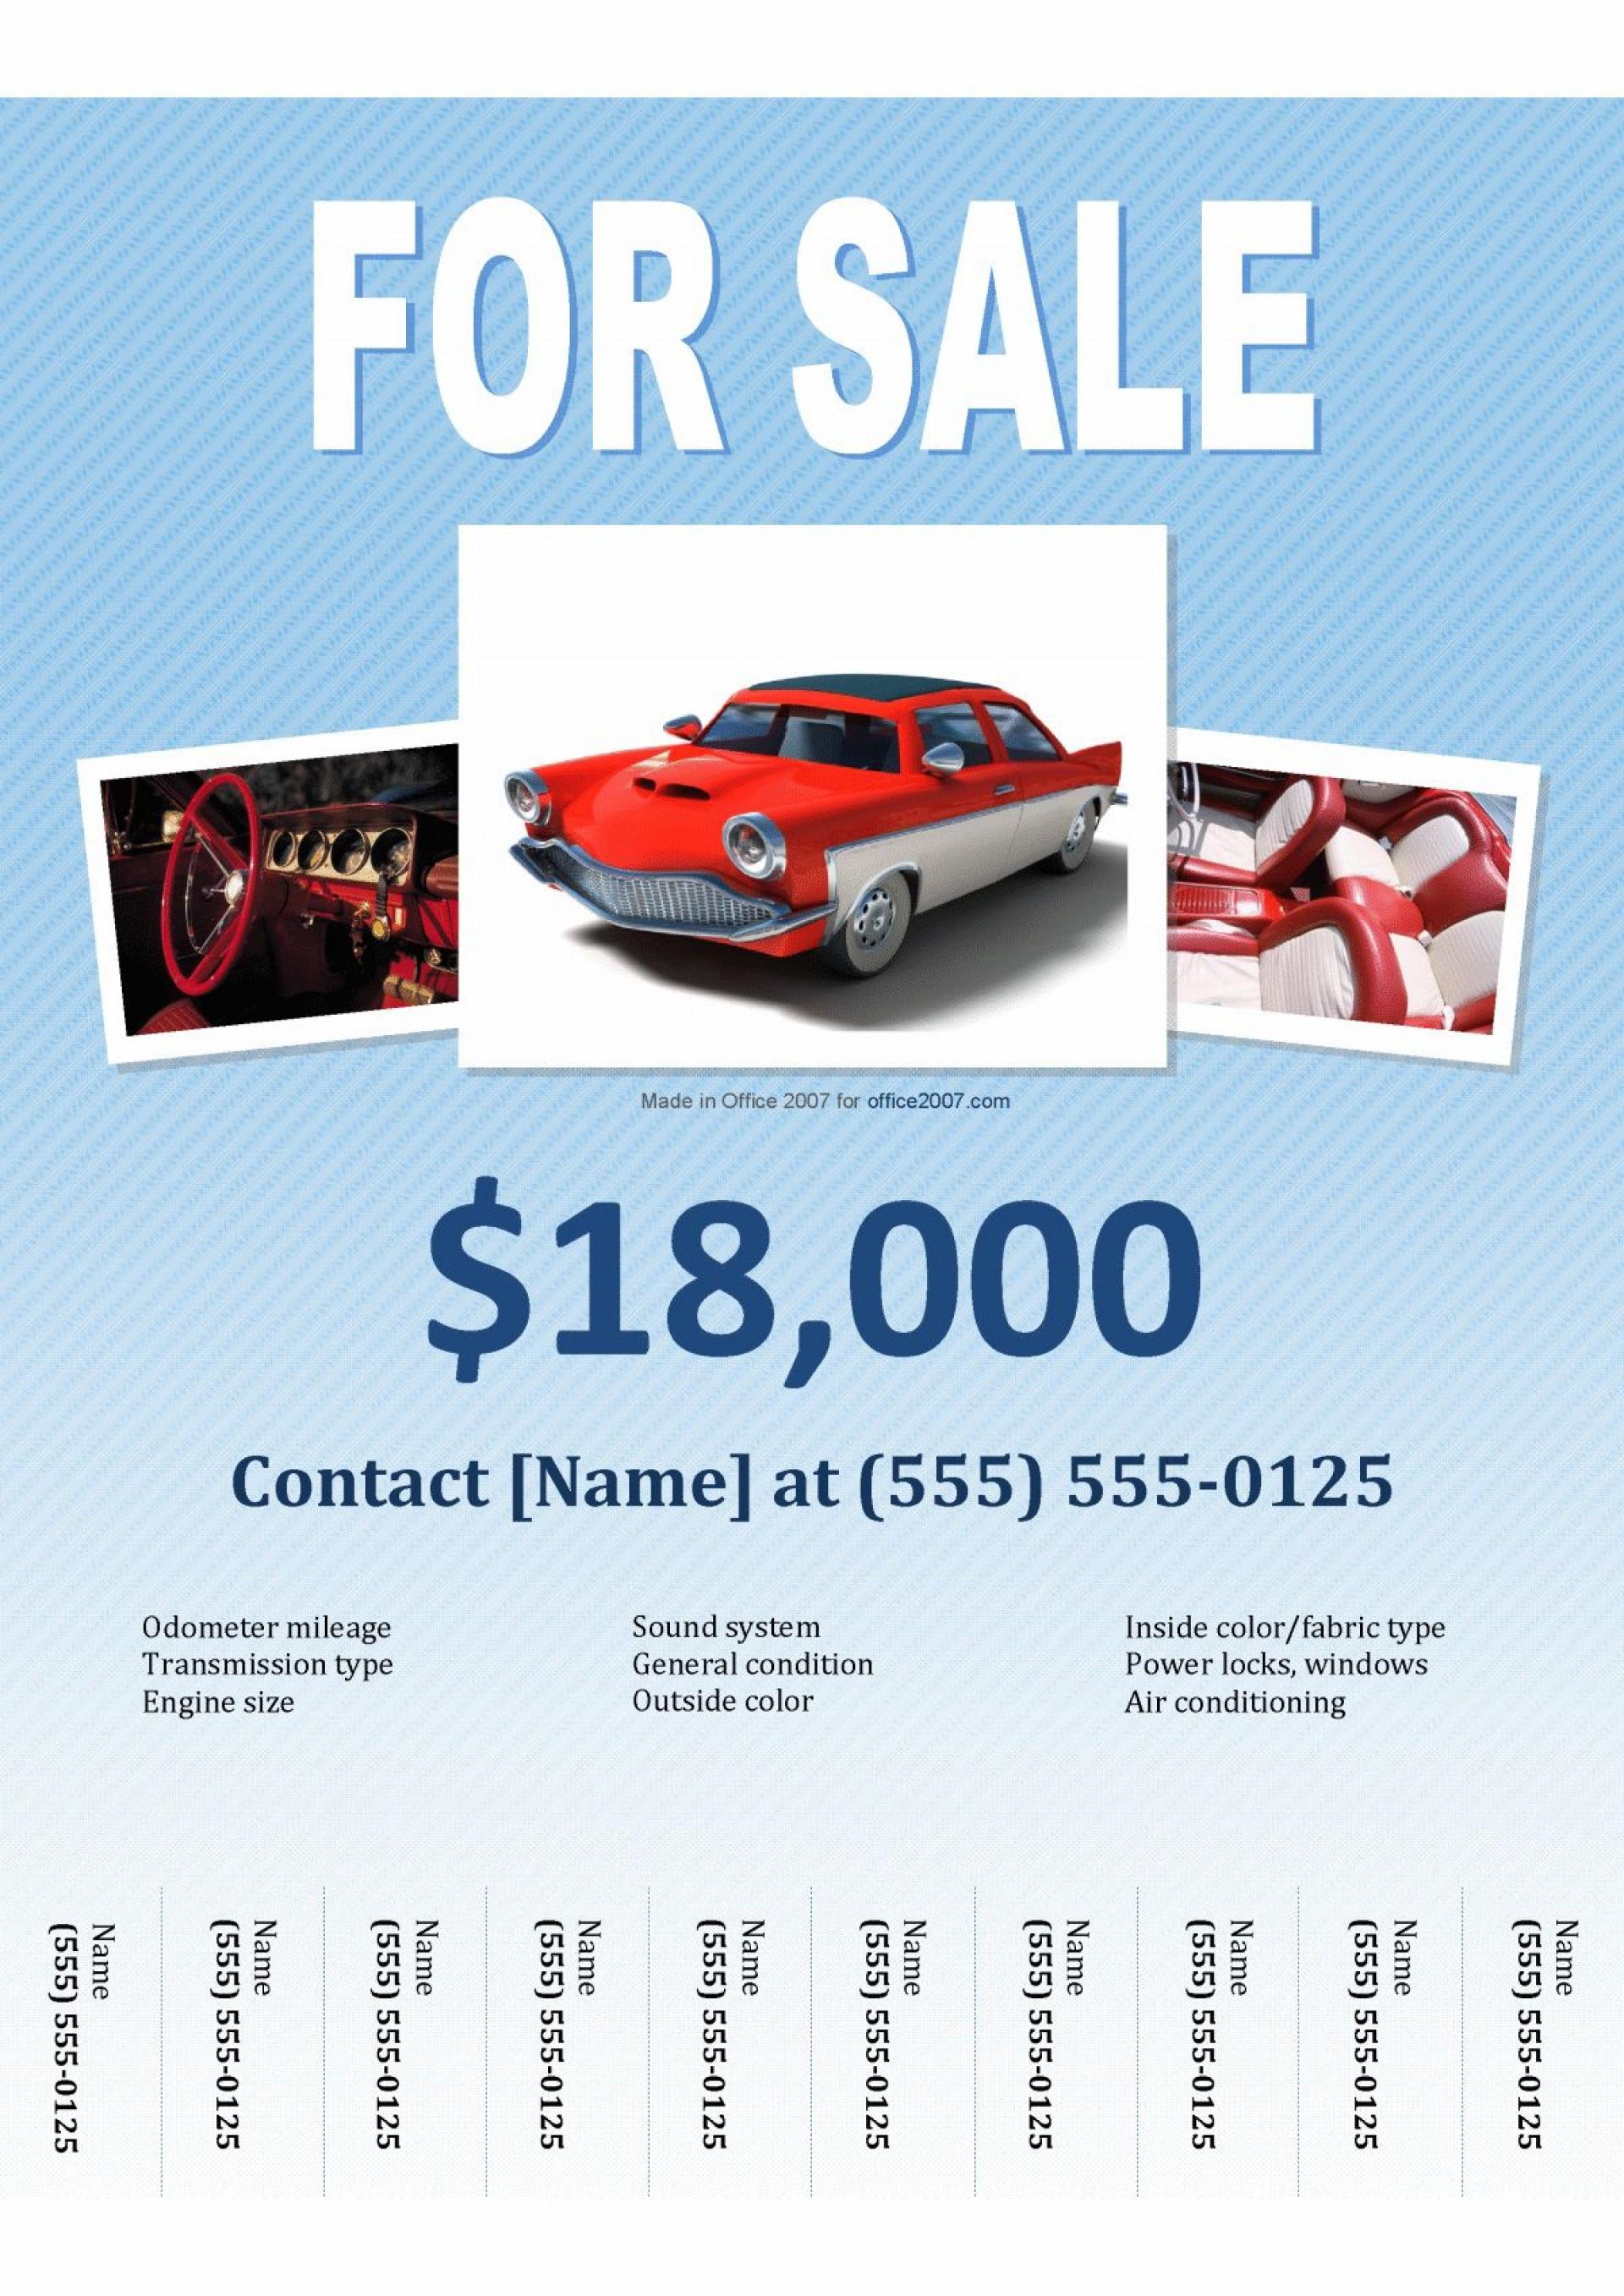 005 Singular For Sale Flyer Template Highest Quality  Car Ad Microsoft Word House1920